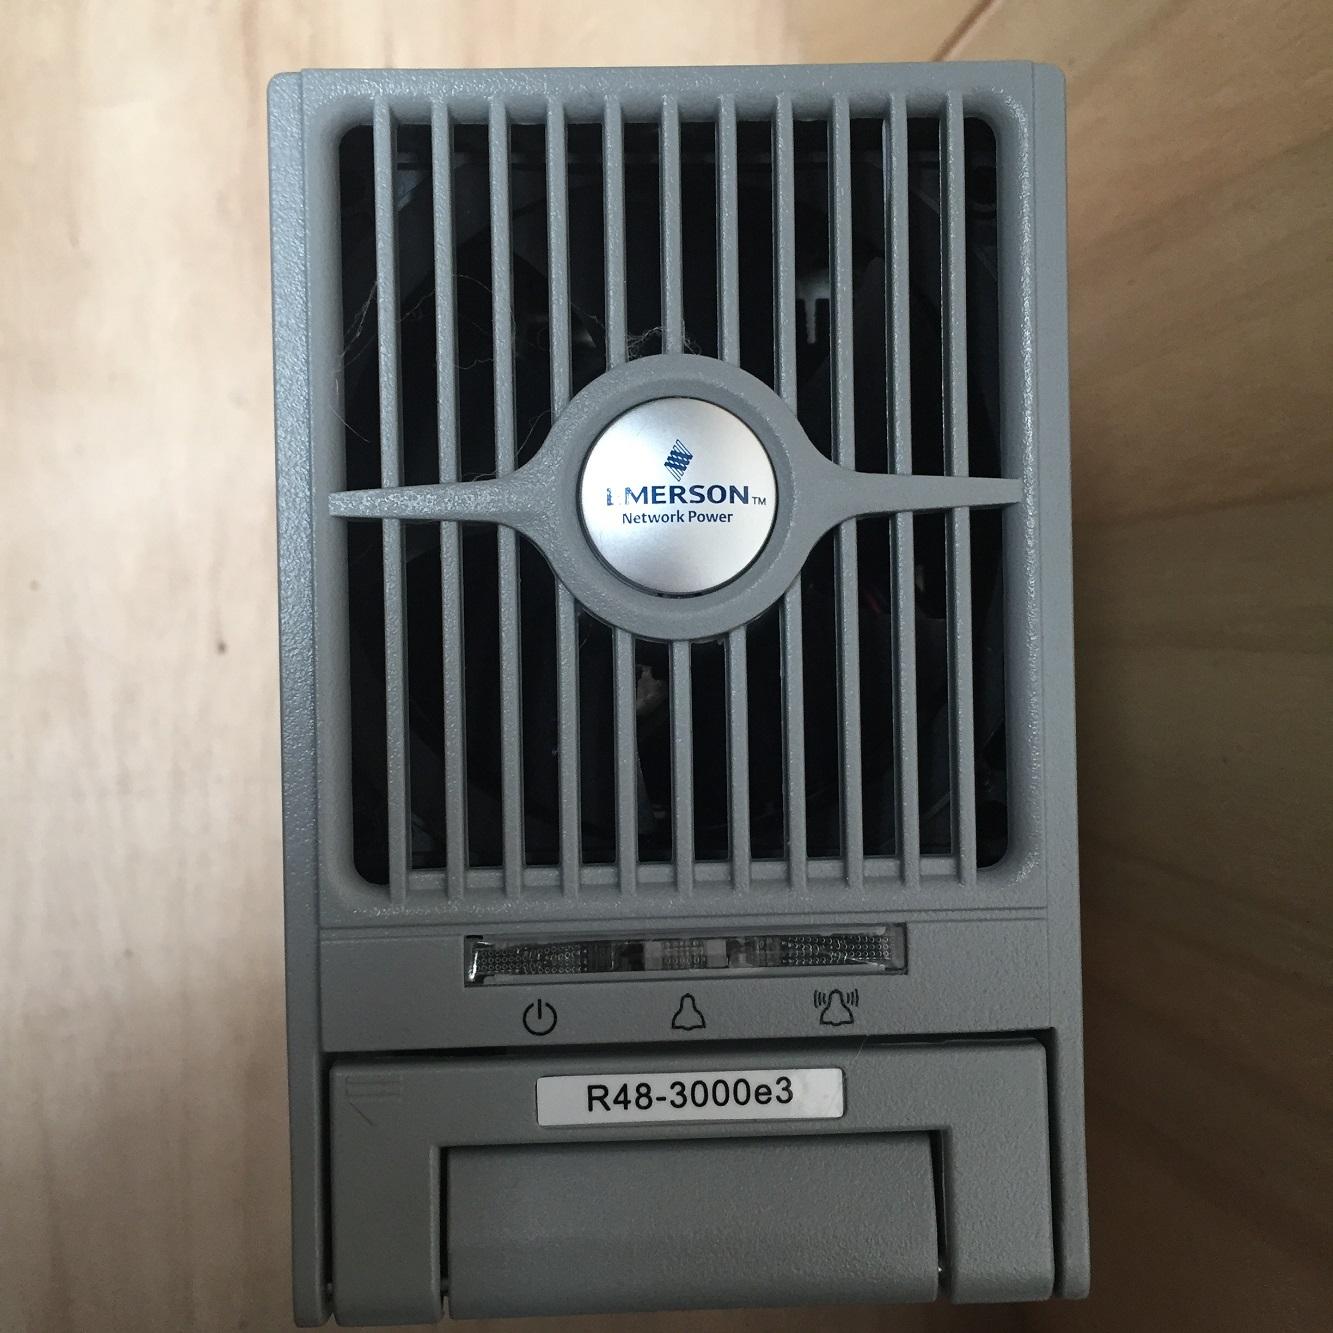 emerson R48-3000e3 energiaegység